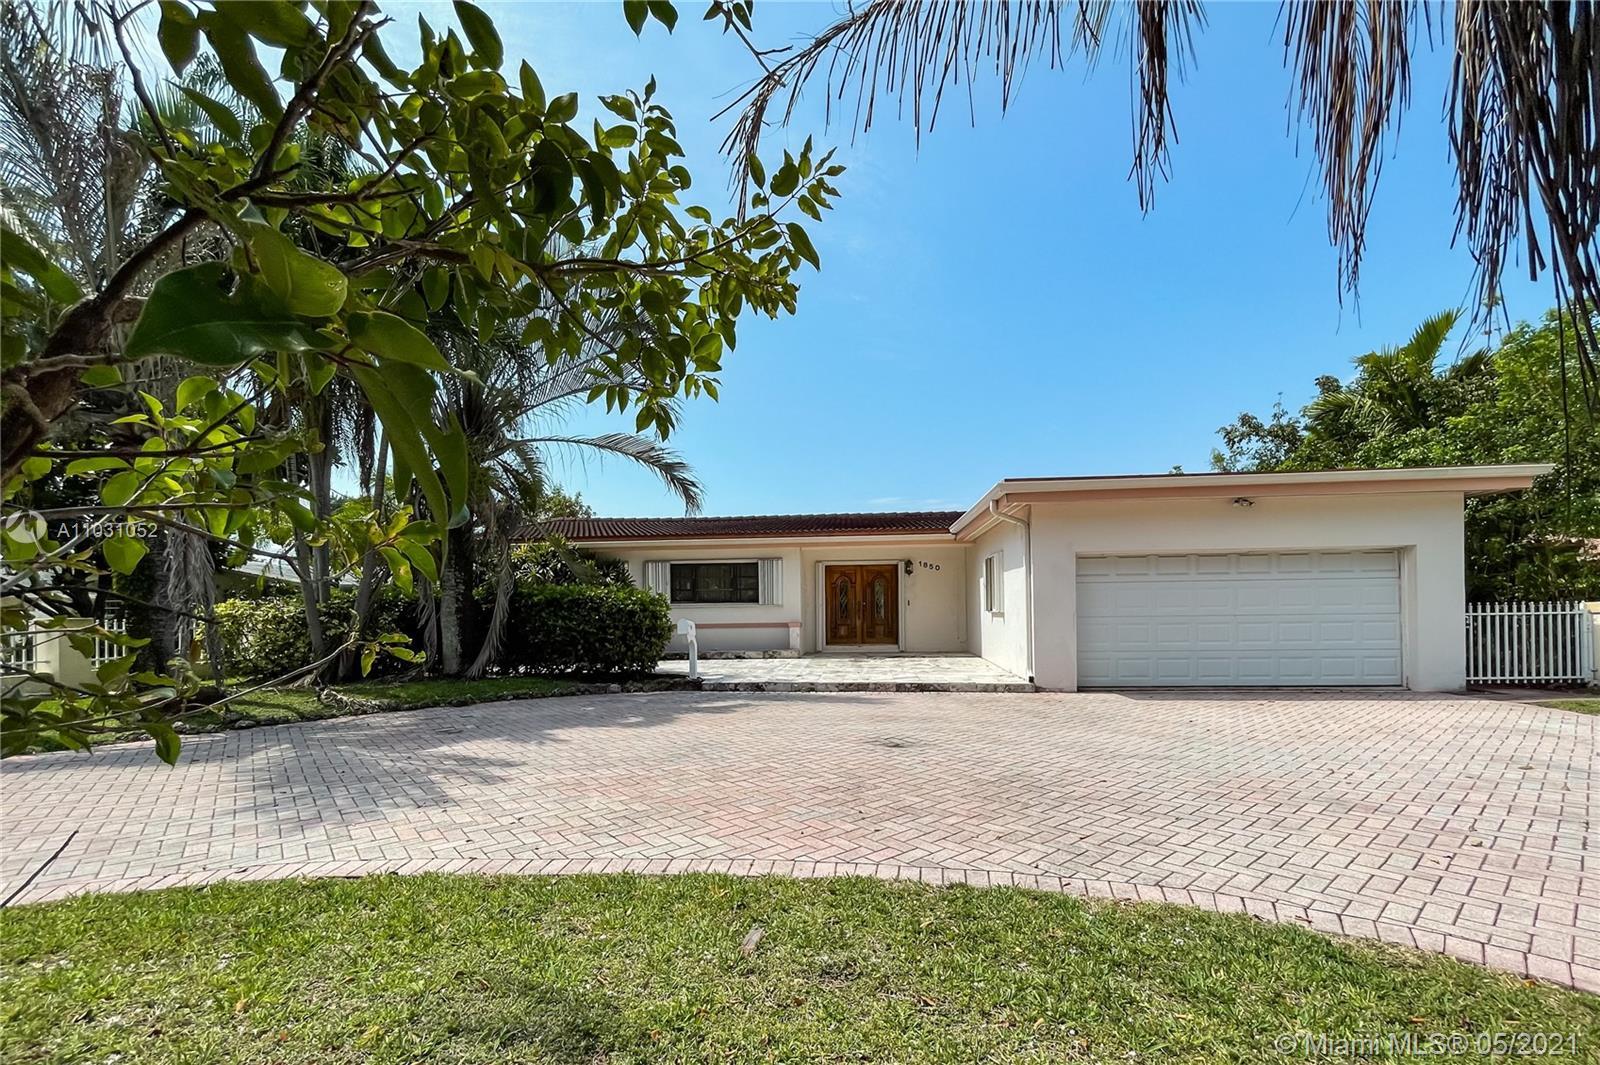 Keystone Point - 1850 Hibiscus Dr, North Miami, FL 33181